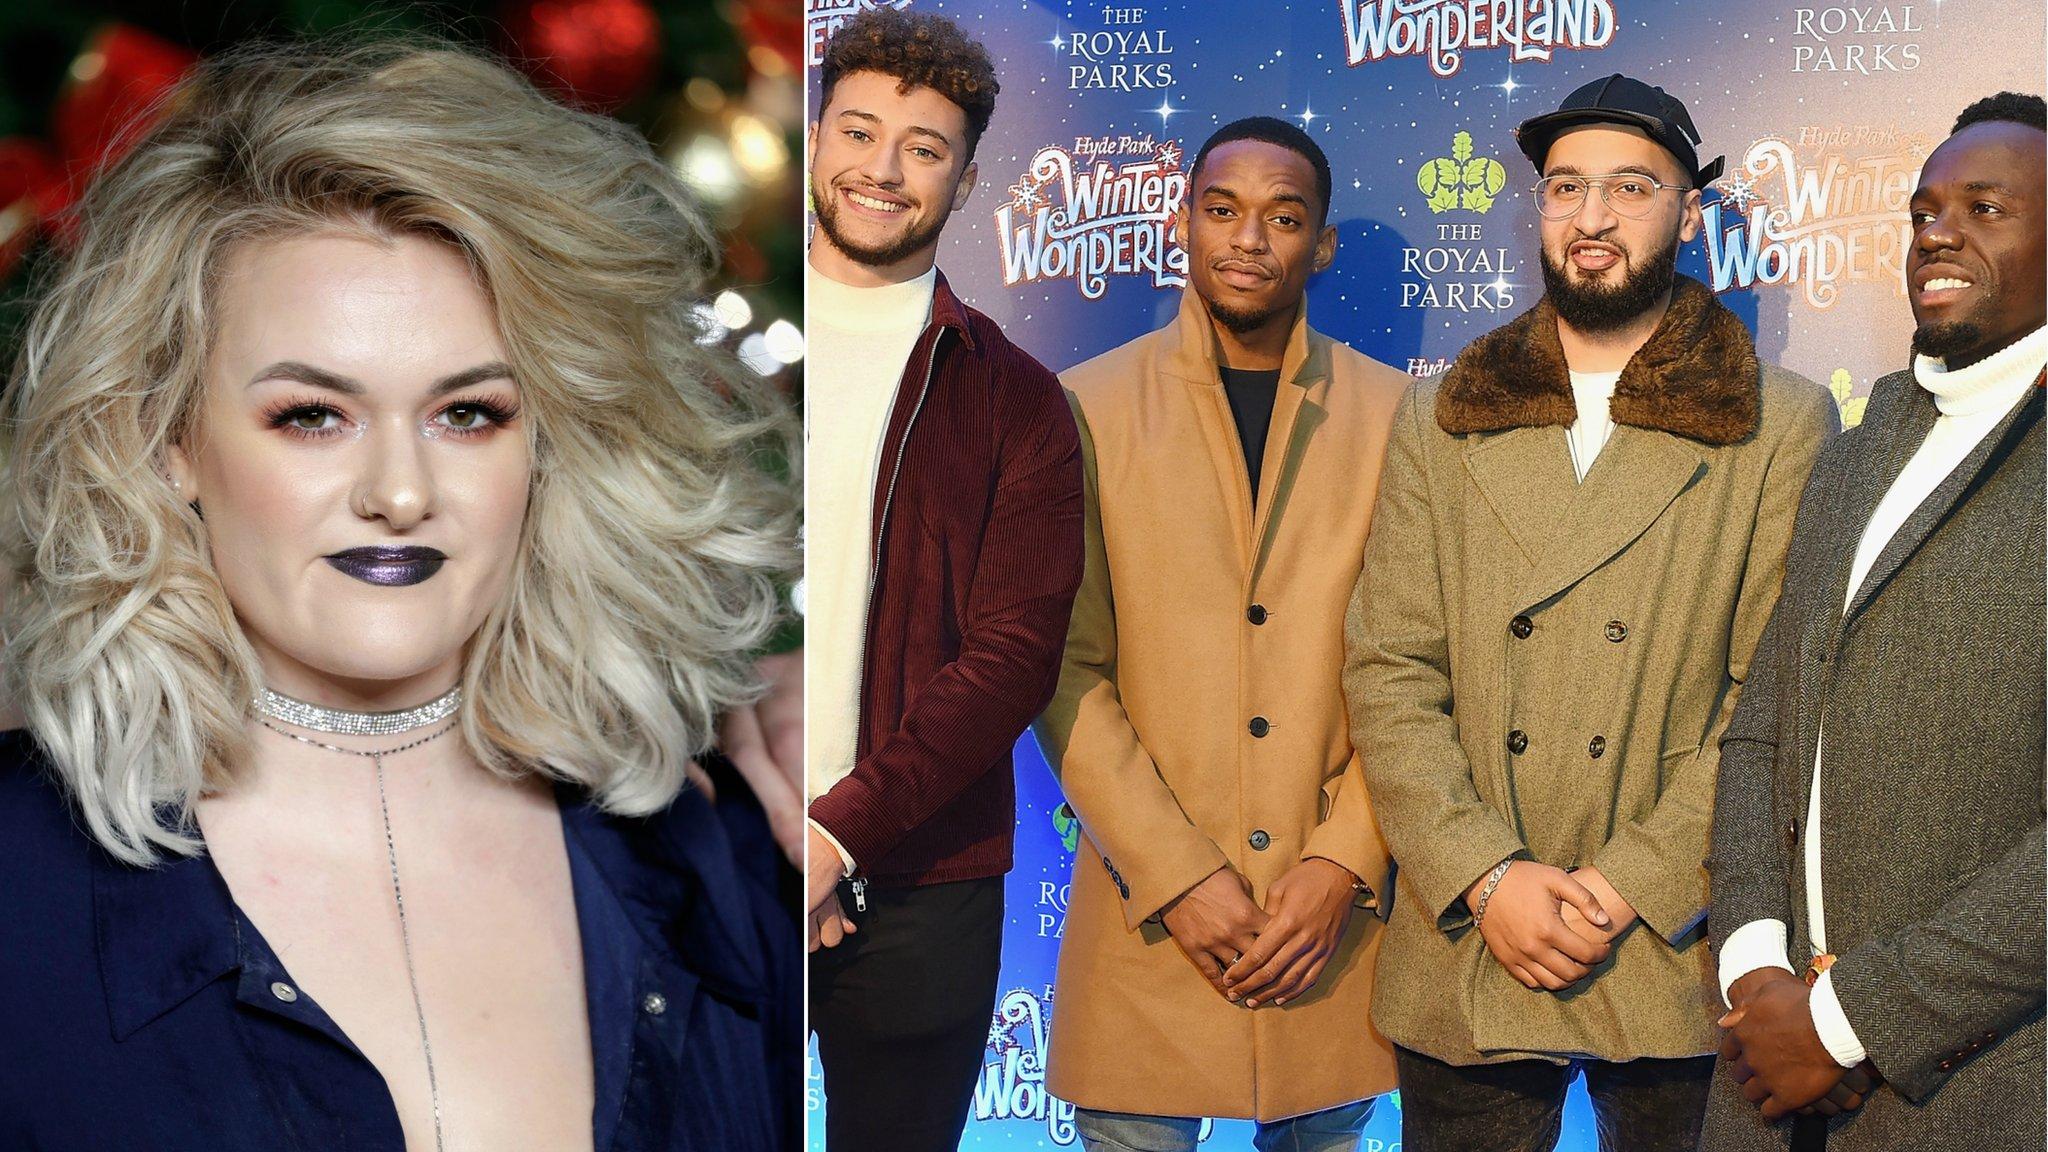 X Factor: Rak-su are the winners! - CBBC Newsround